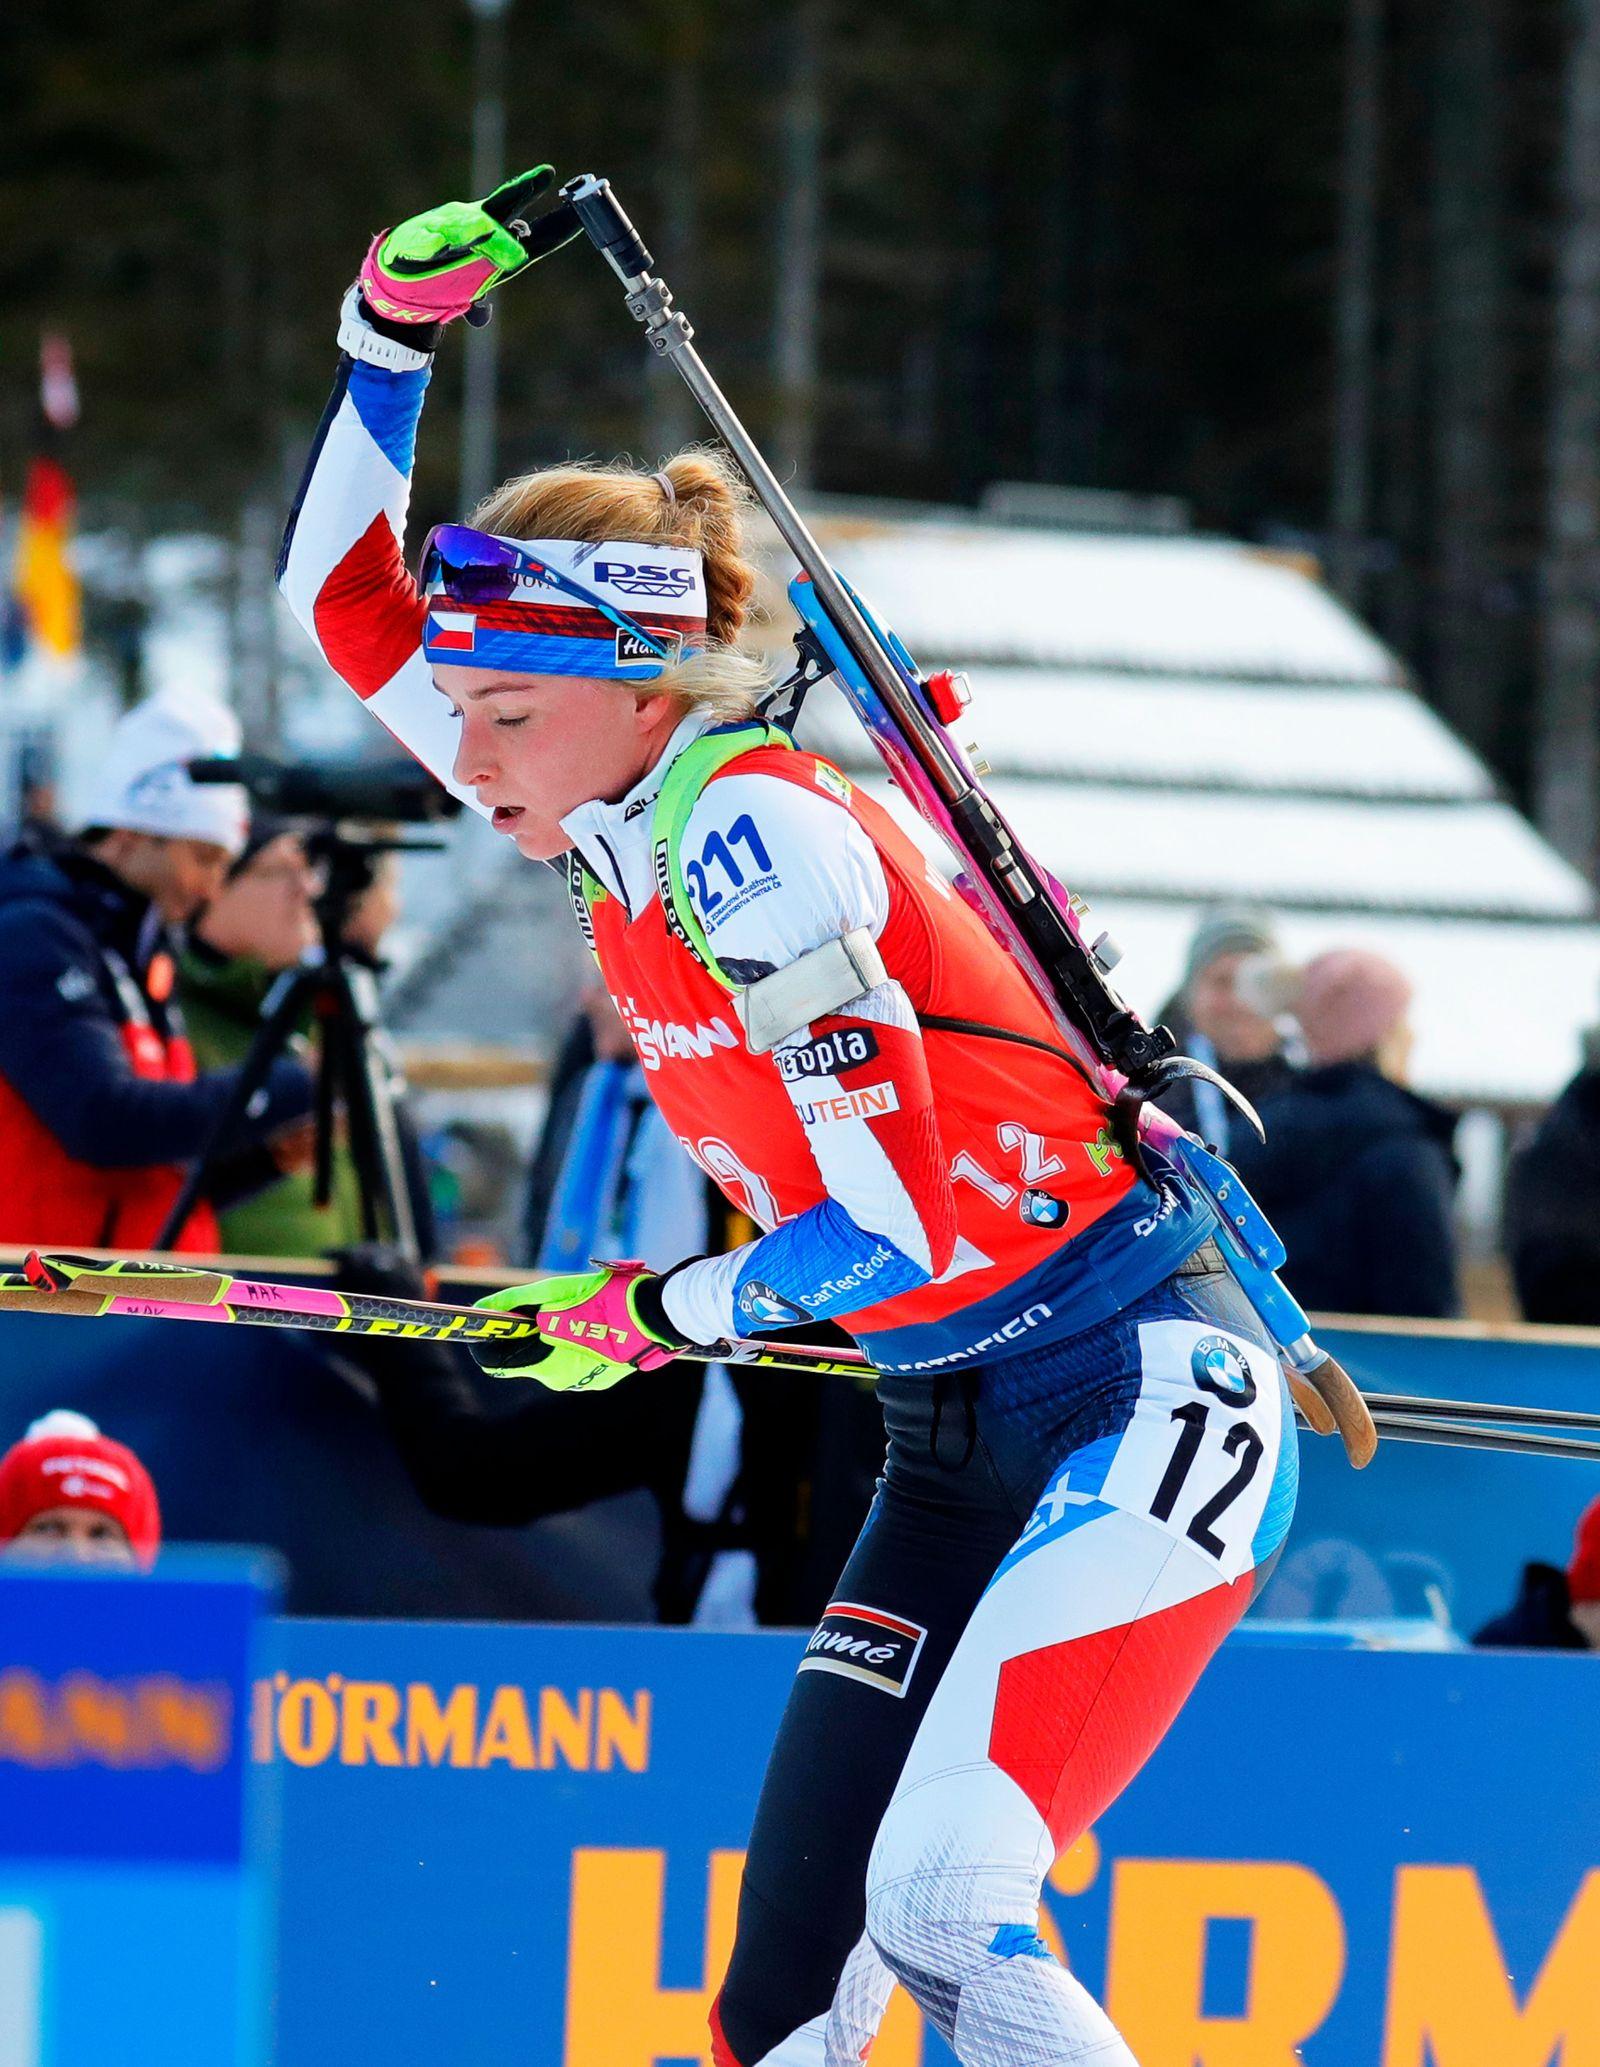 Biathlon World Cup in Pokljuka, Slovenia - 26 Jan 2020